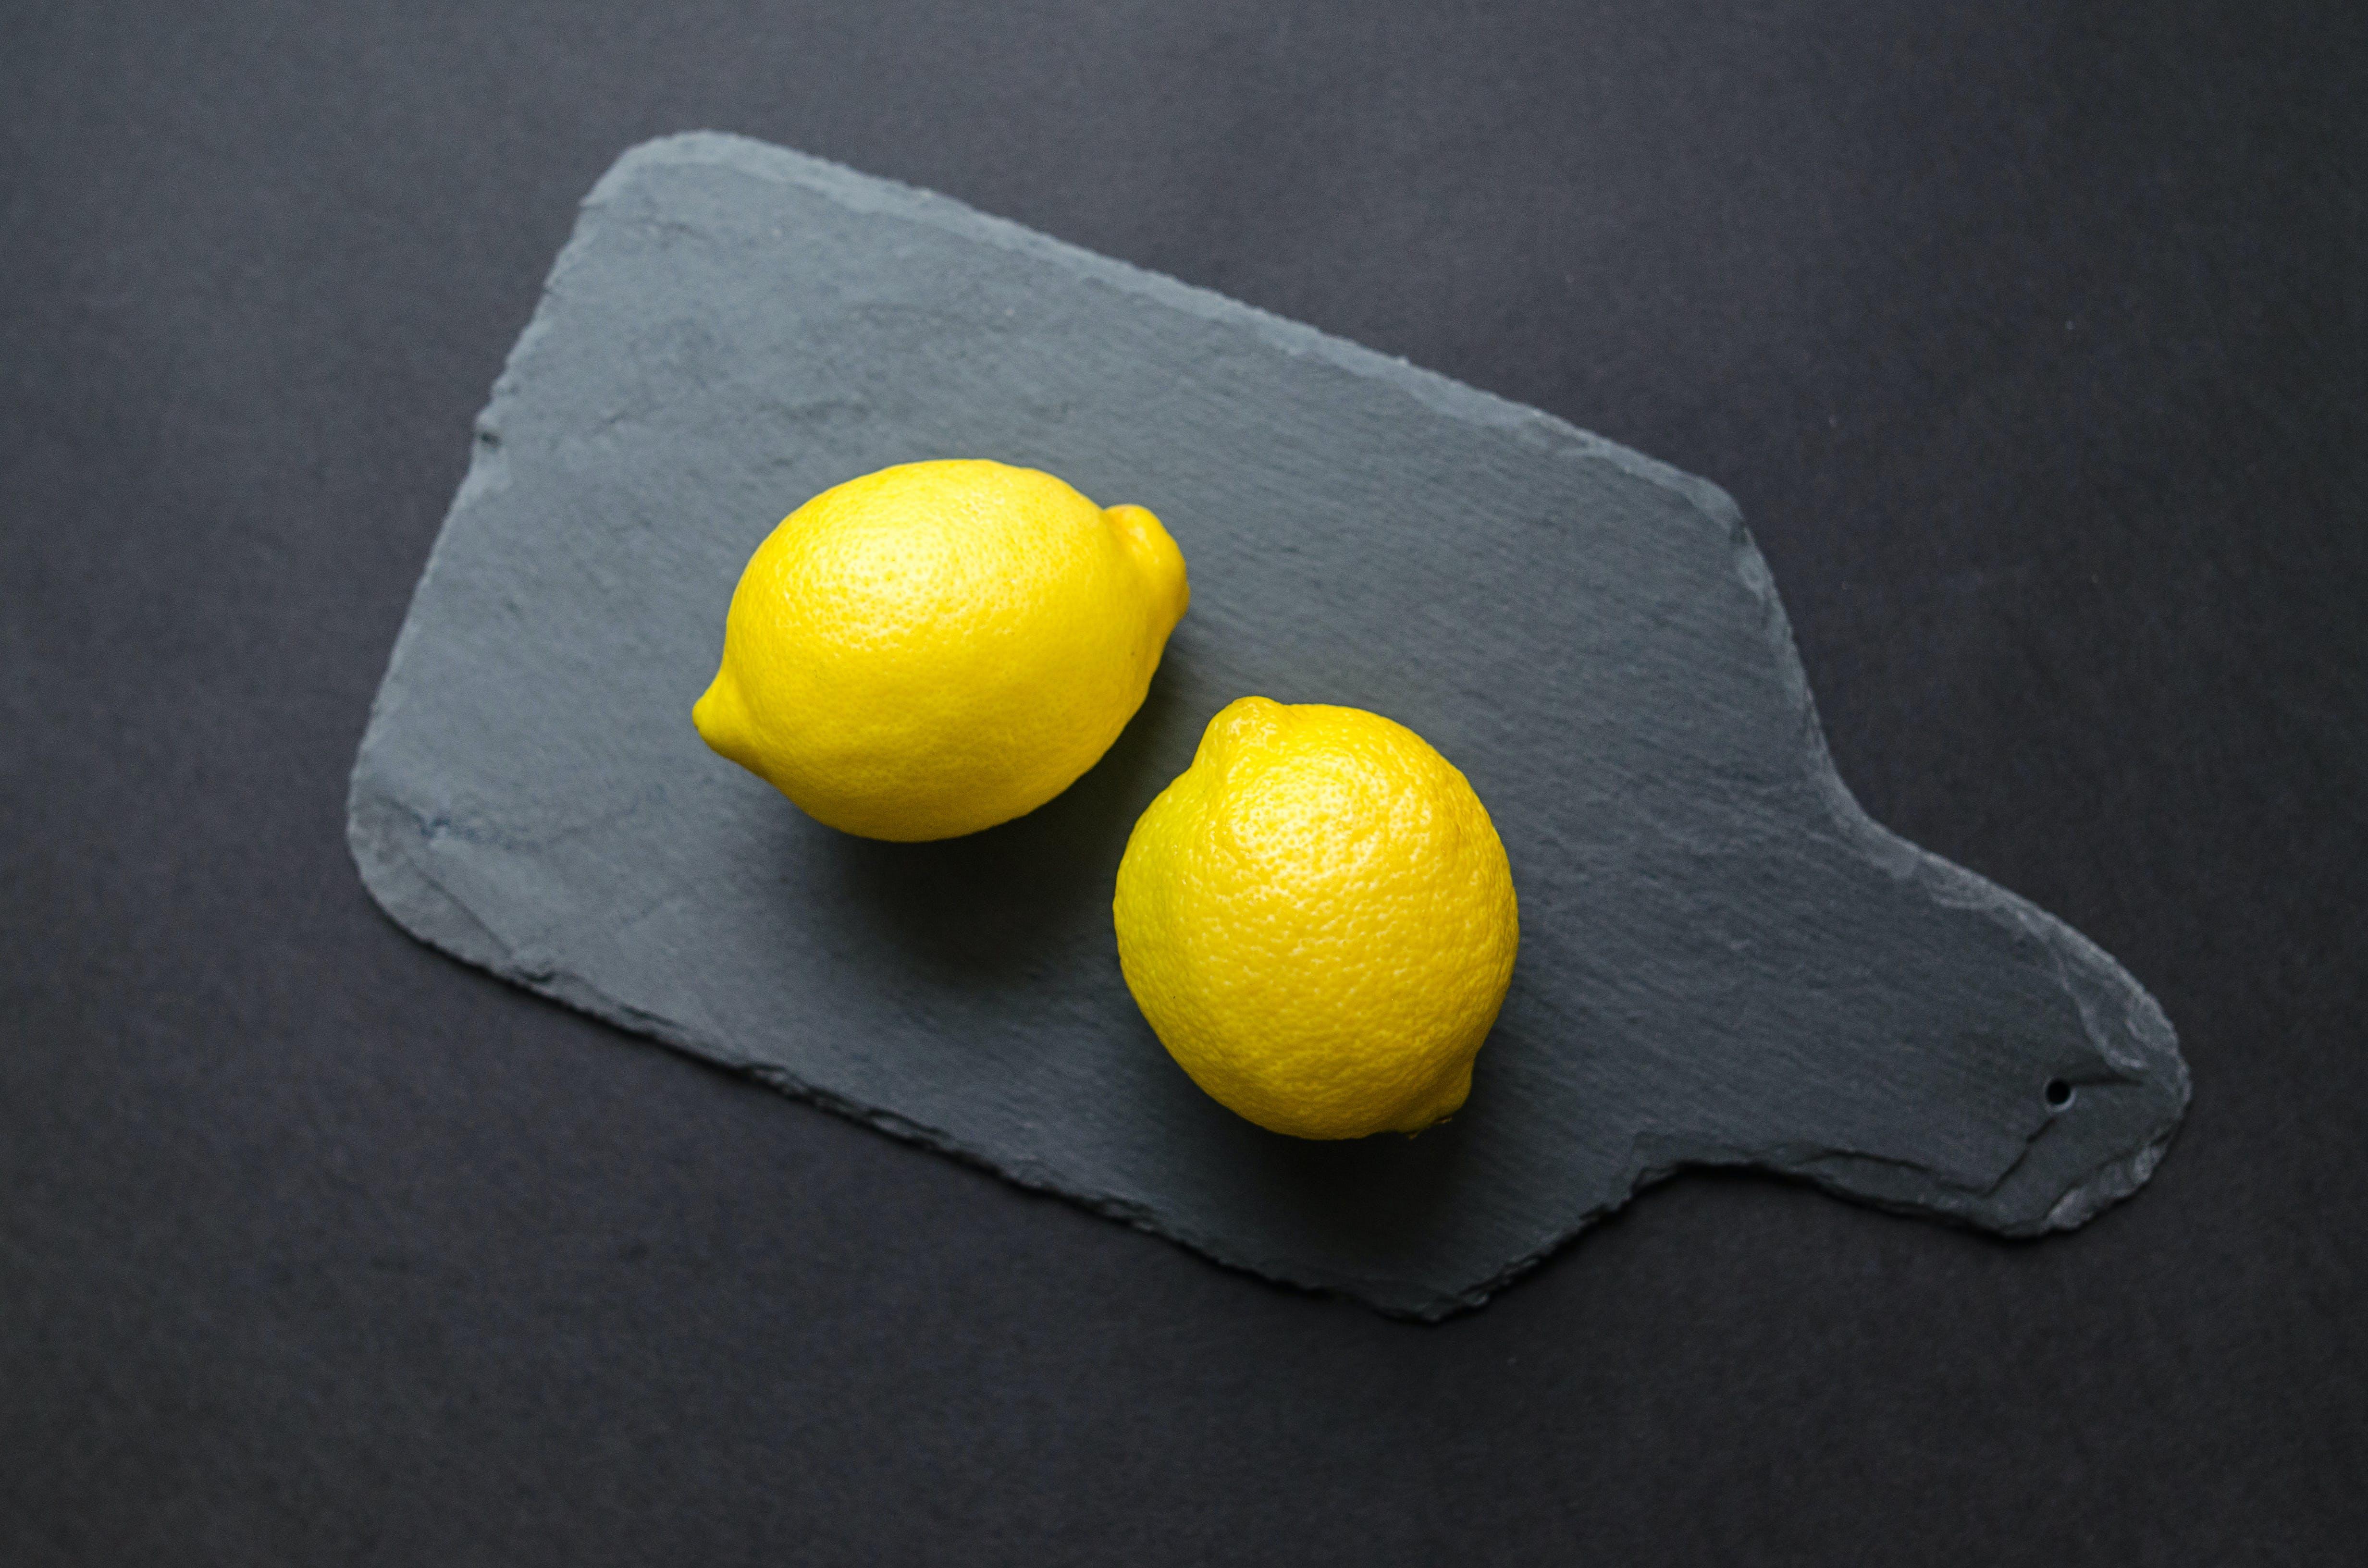 Two Lemons on Black Wooden Pad